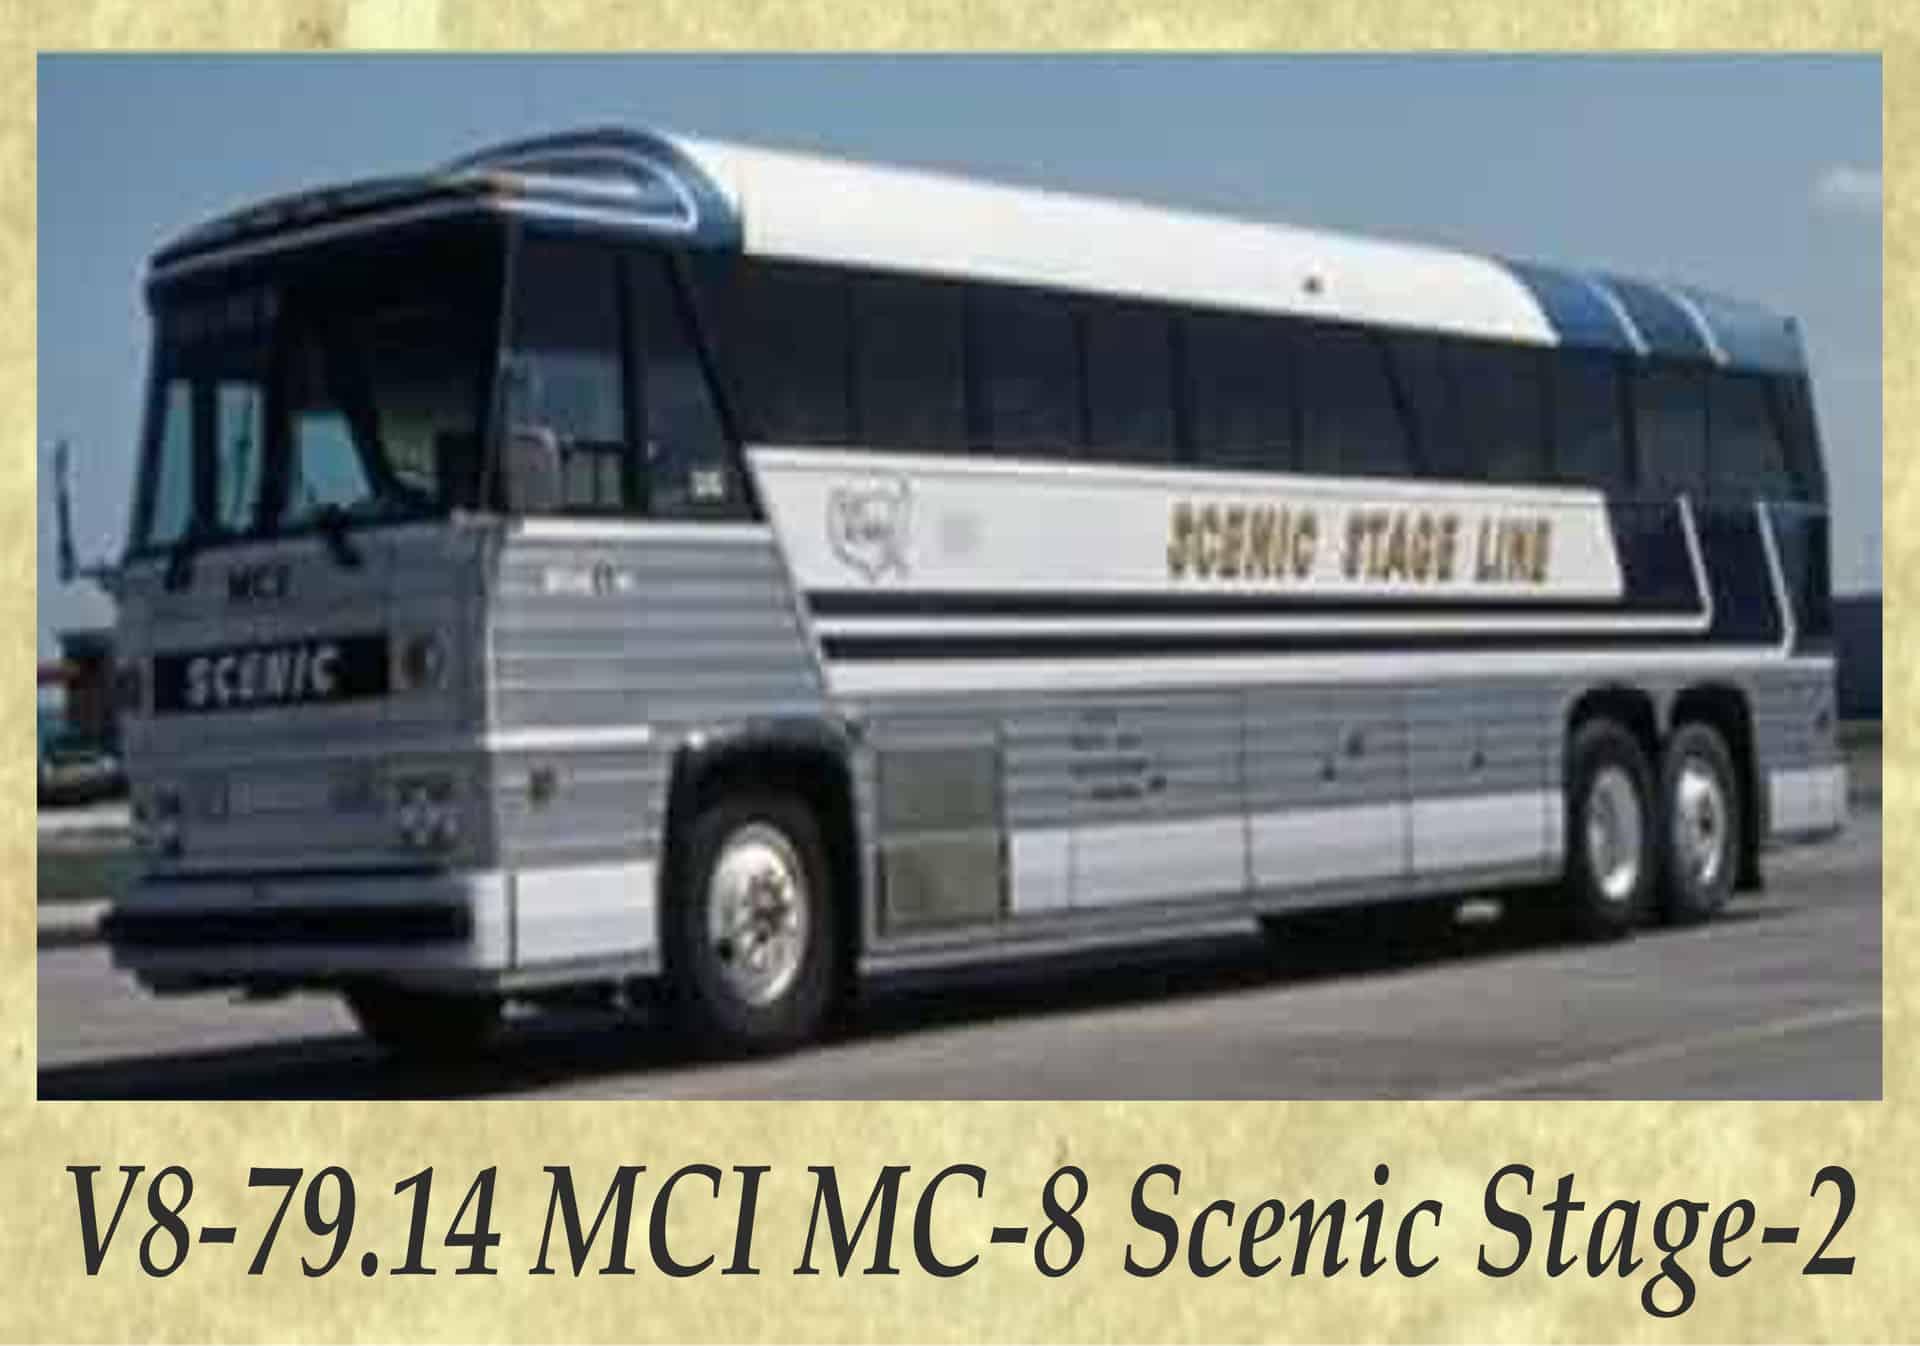 V8-79.14 MCI MC-8 Scenic Stage-2